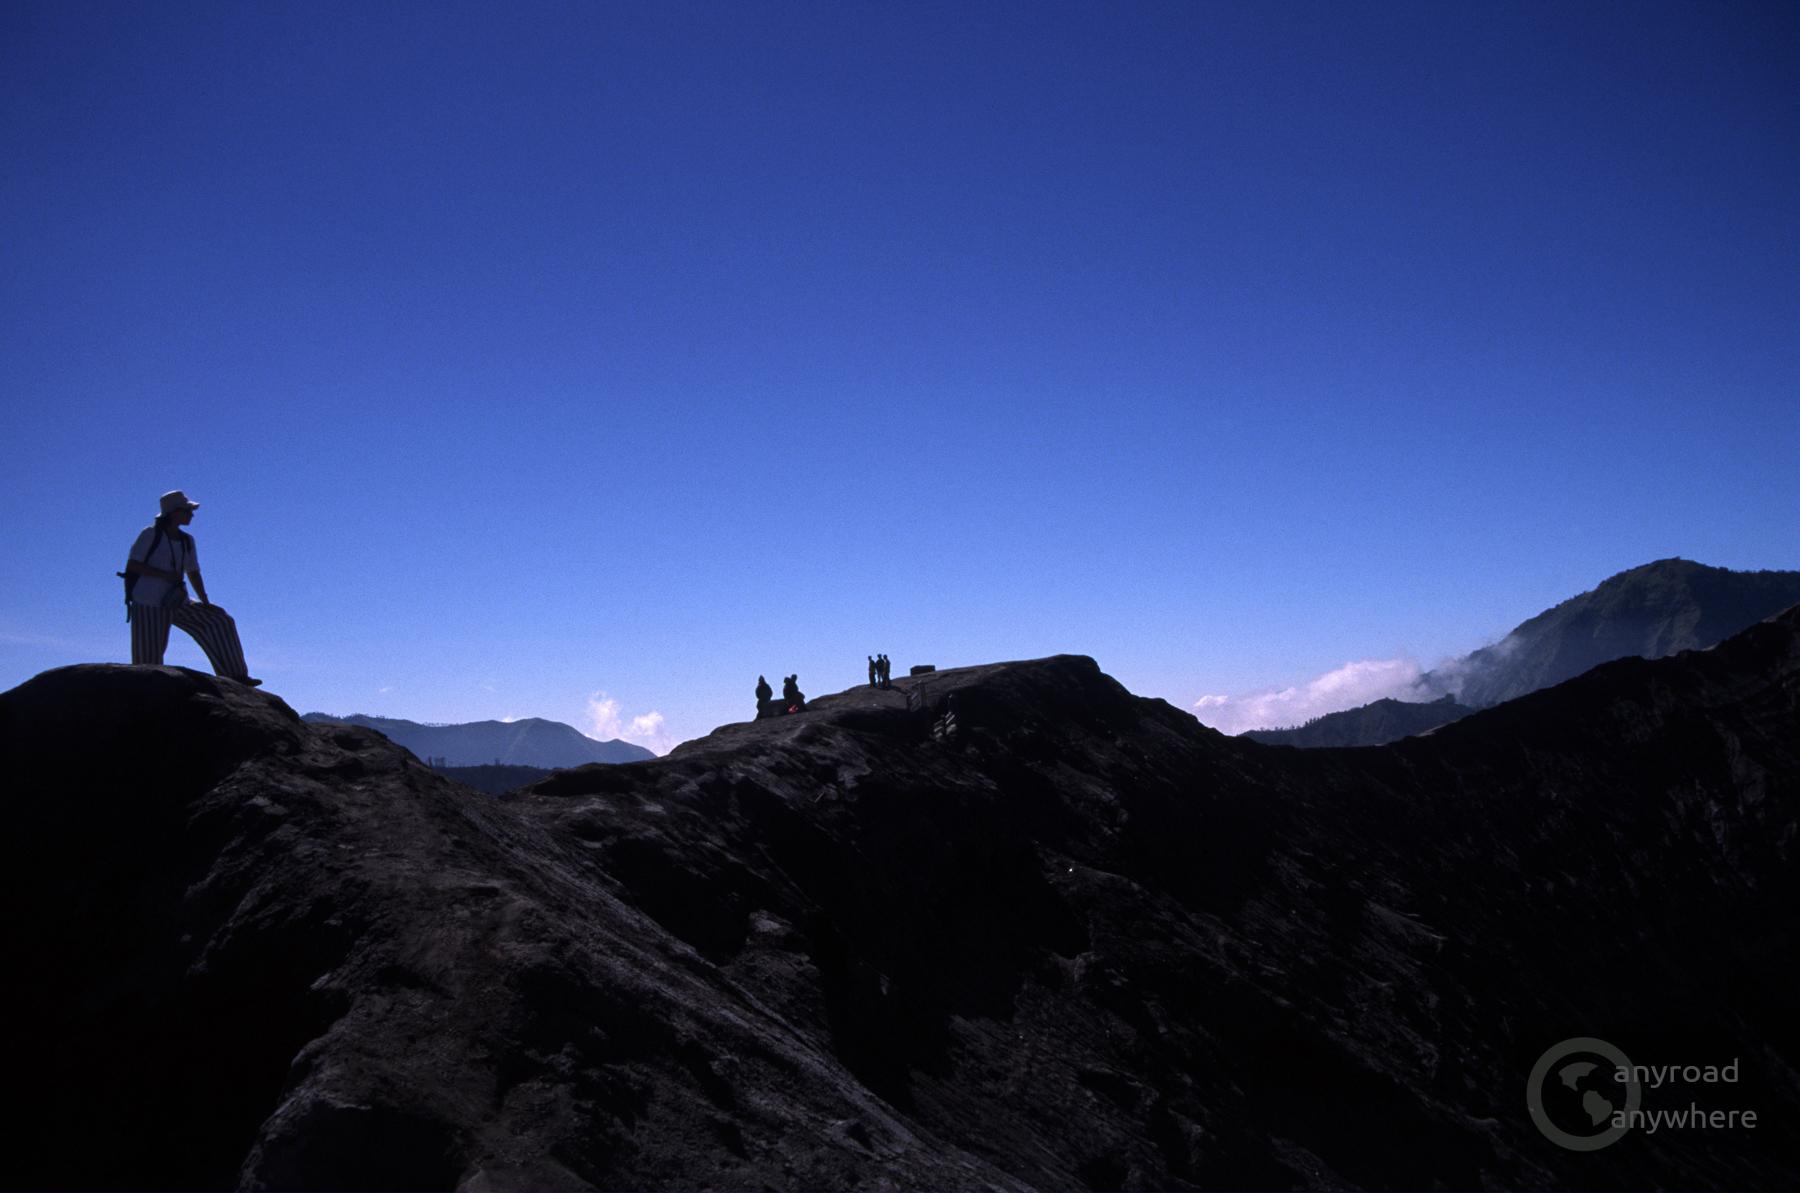 Walking on the crater rim of Mount Bromo